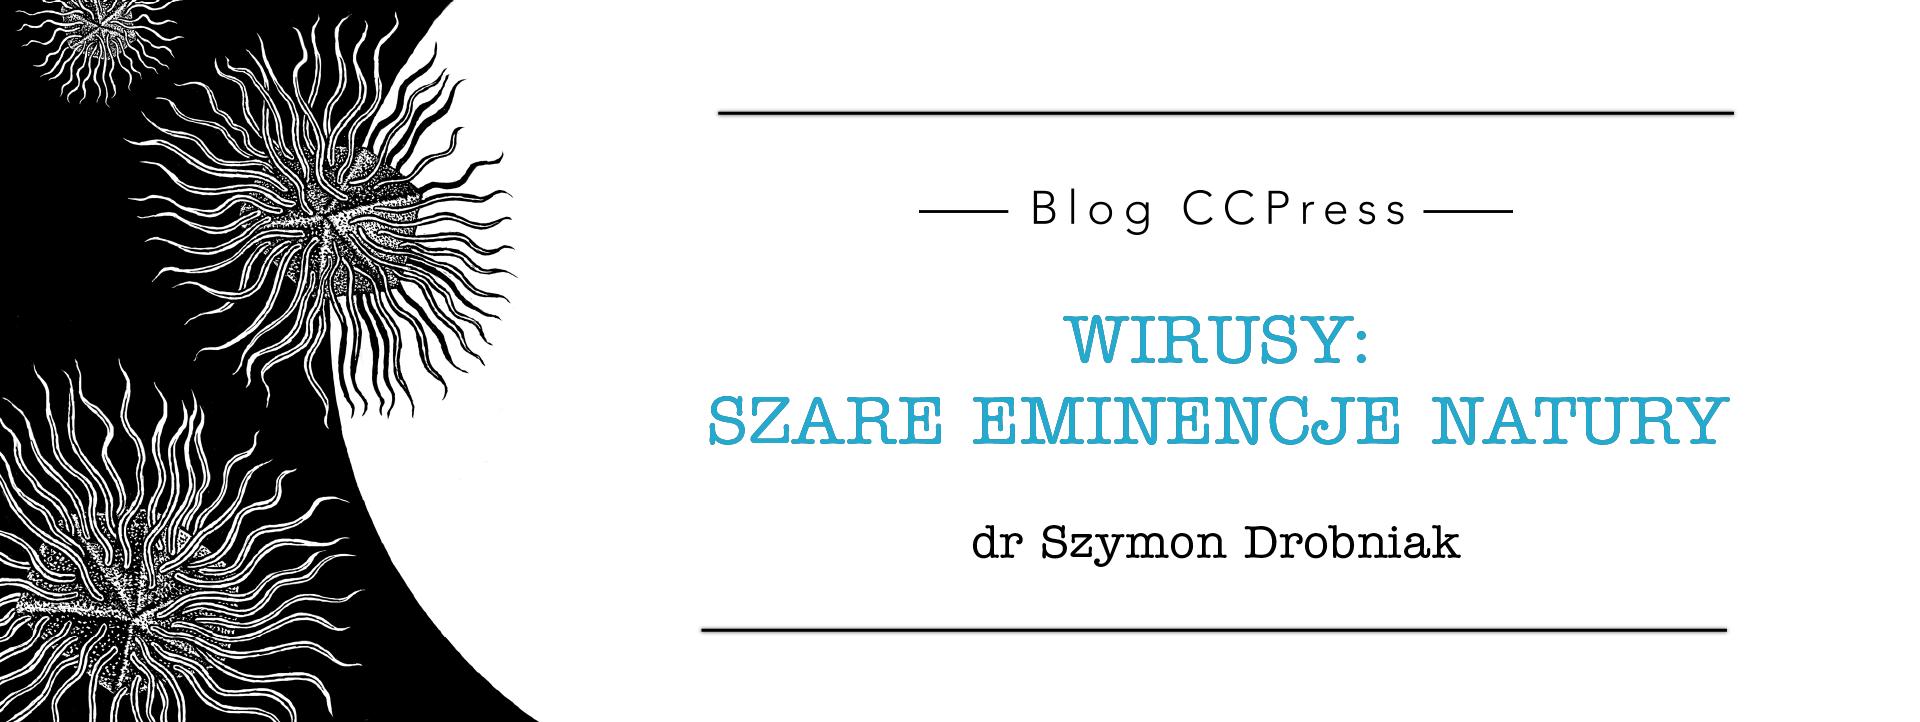 Wirusy: szare eminencje natury